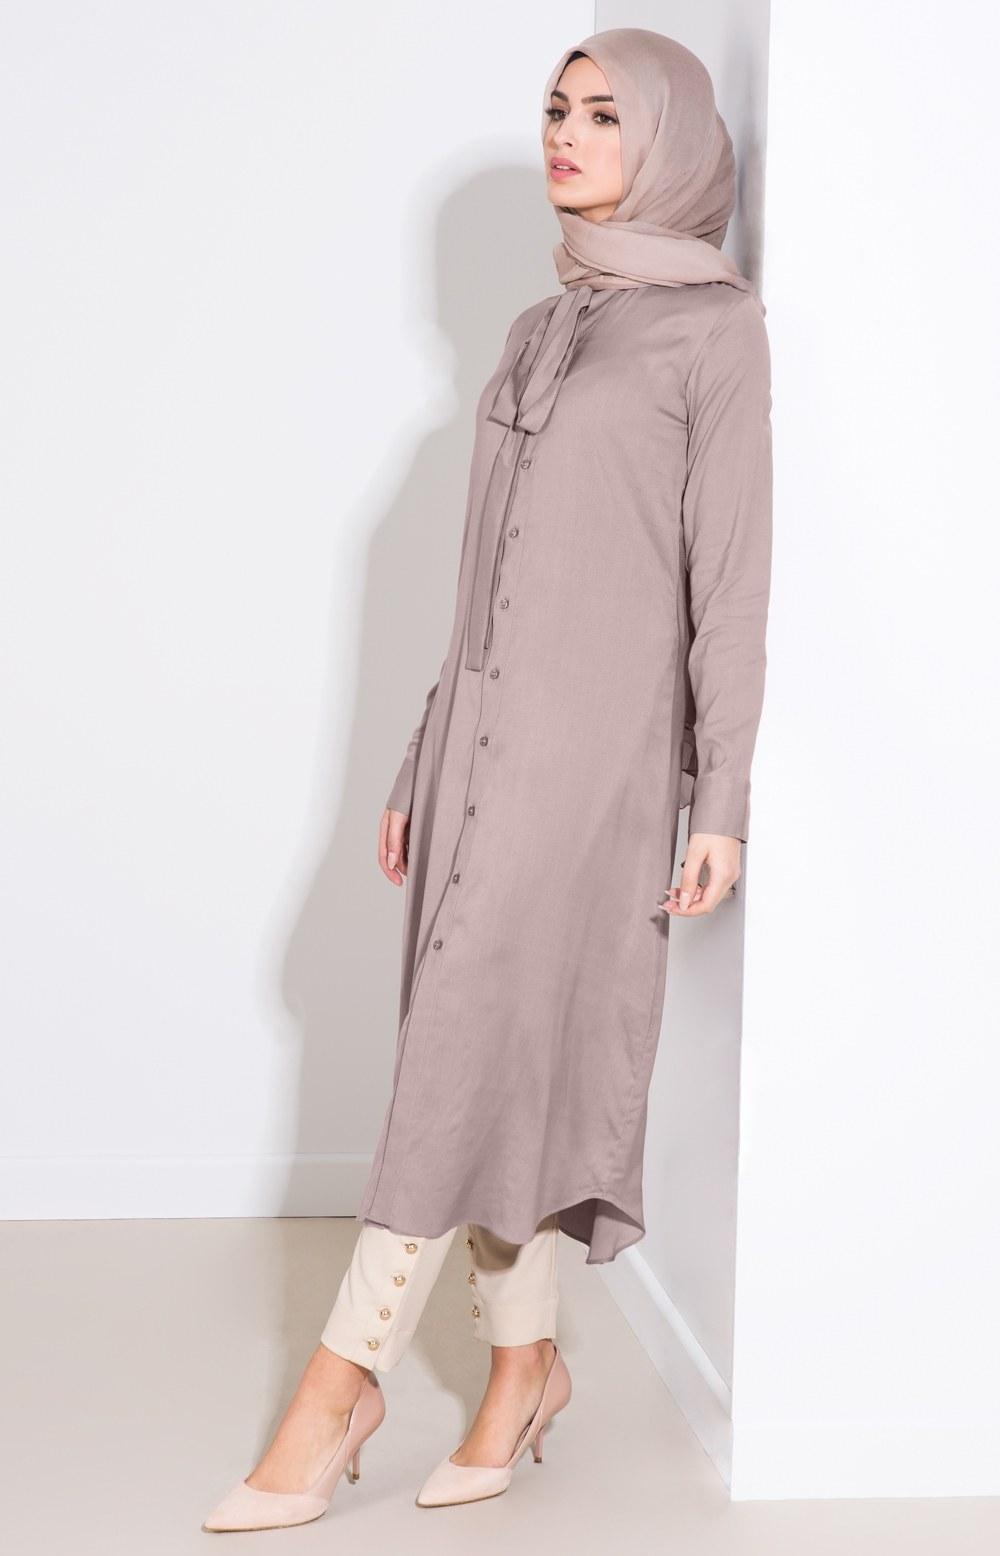 Inspirasi Model Baju Lebaran Dian Pelangi 2017 4pde 25 Trend Model Baju Muslim Lebaran 2018 Simple & Modis